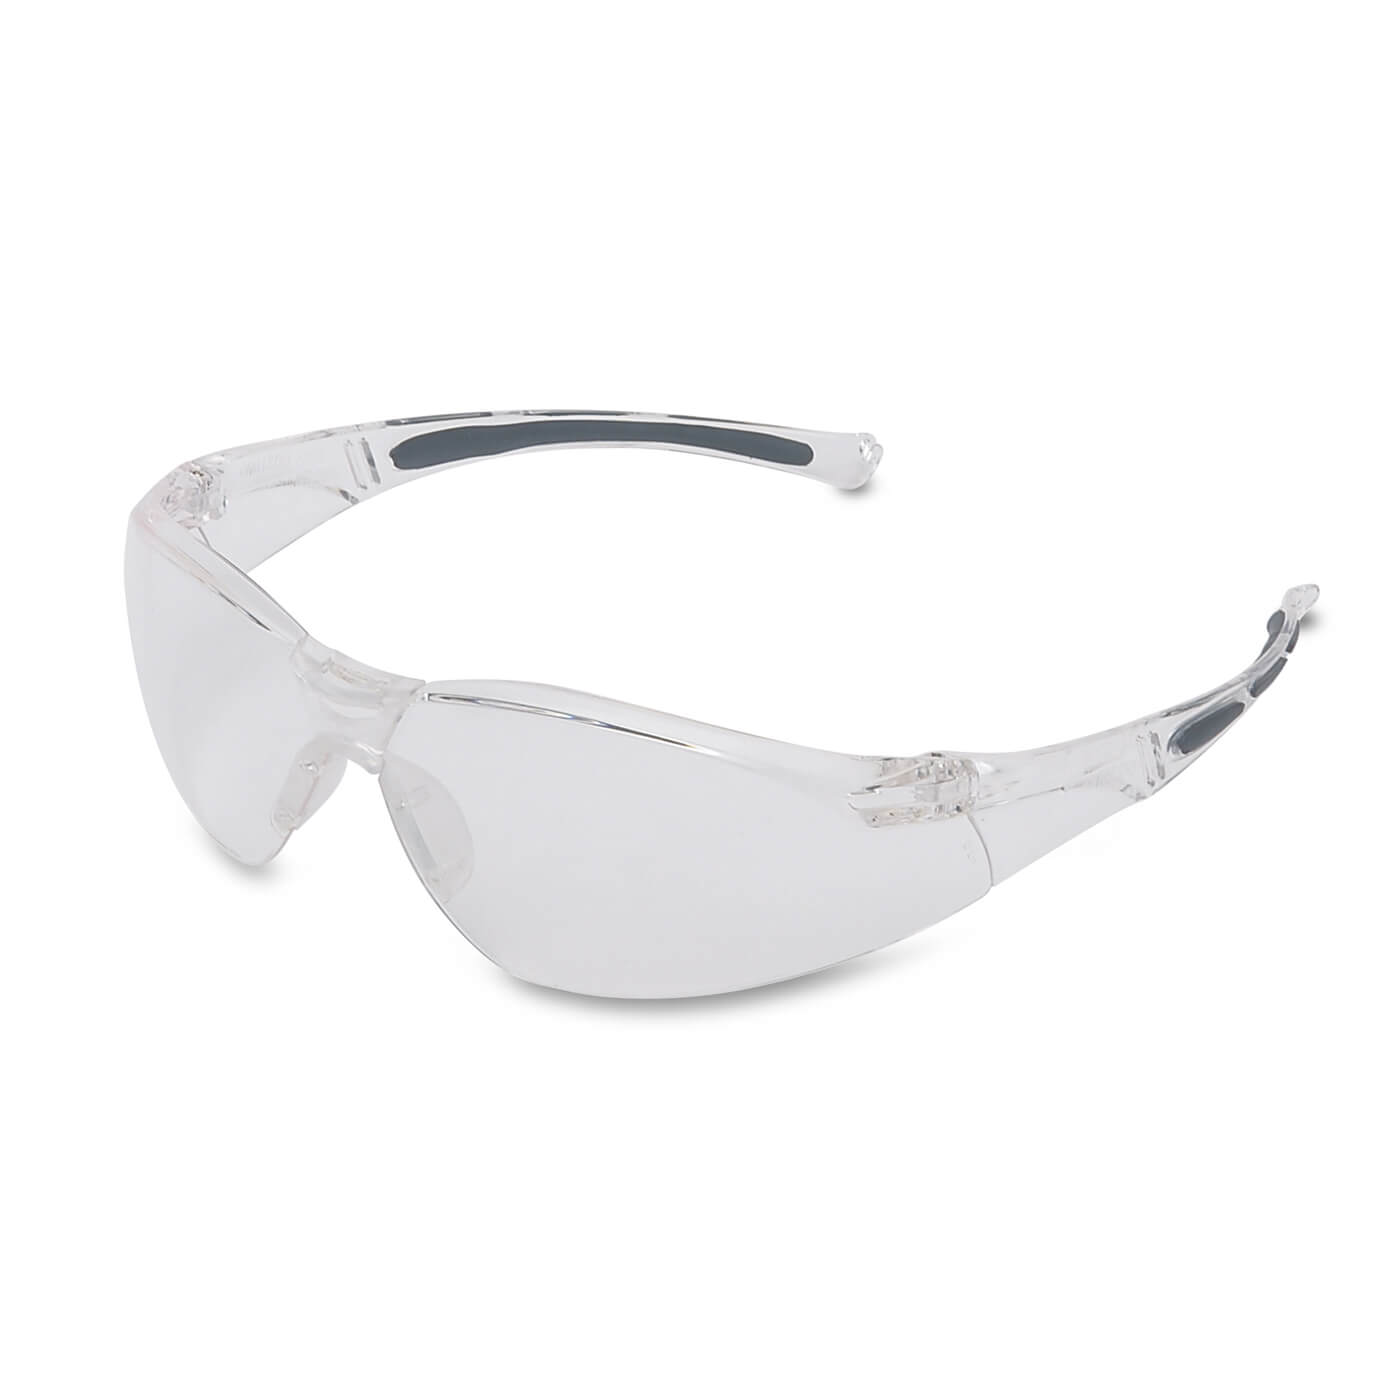 Okulary ochronne A800 1015369 Honeywell bezbarwne